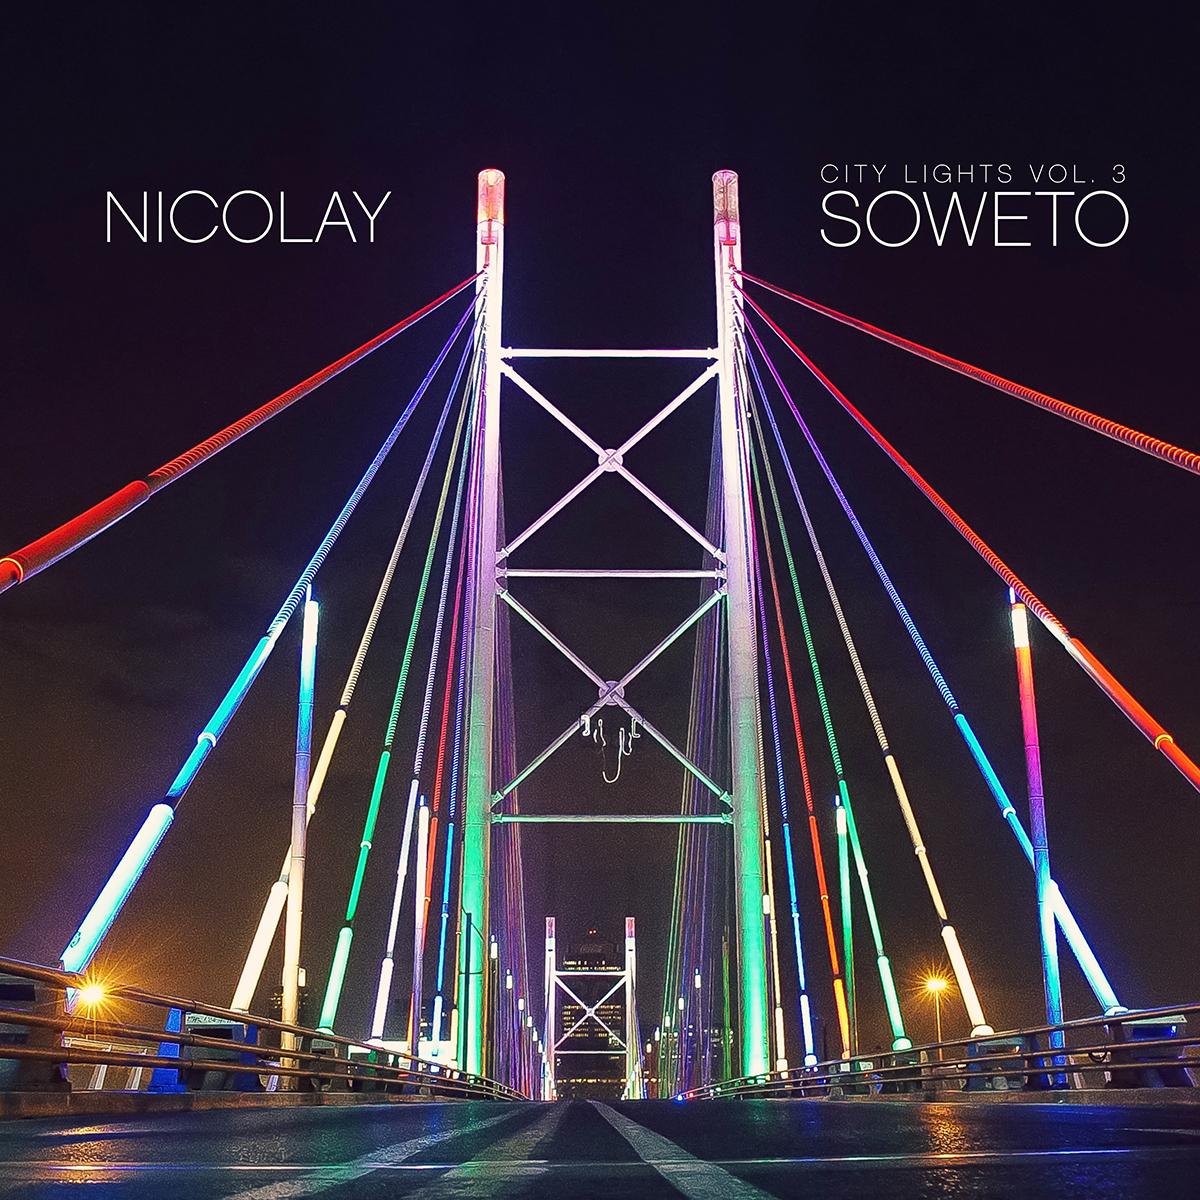 7. Nicolay - City Lights Vol. 3: Soweto